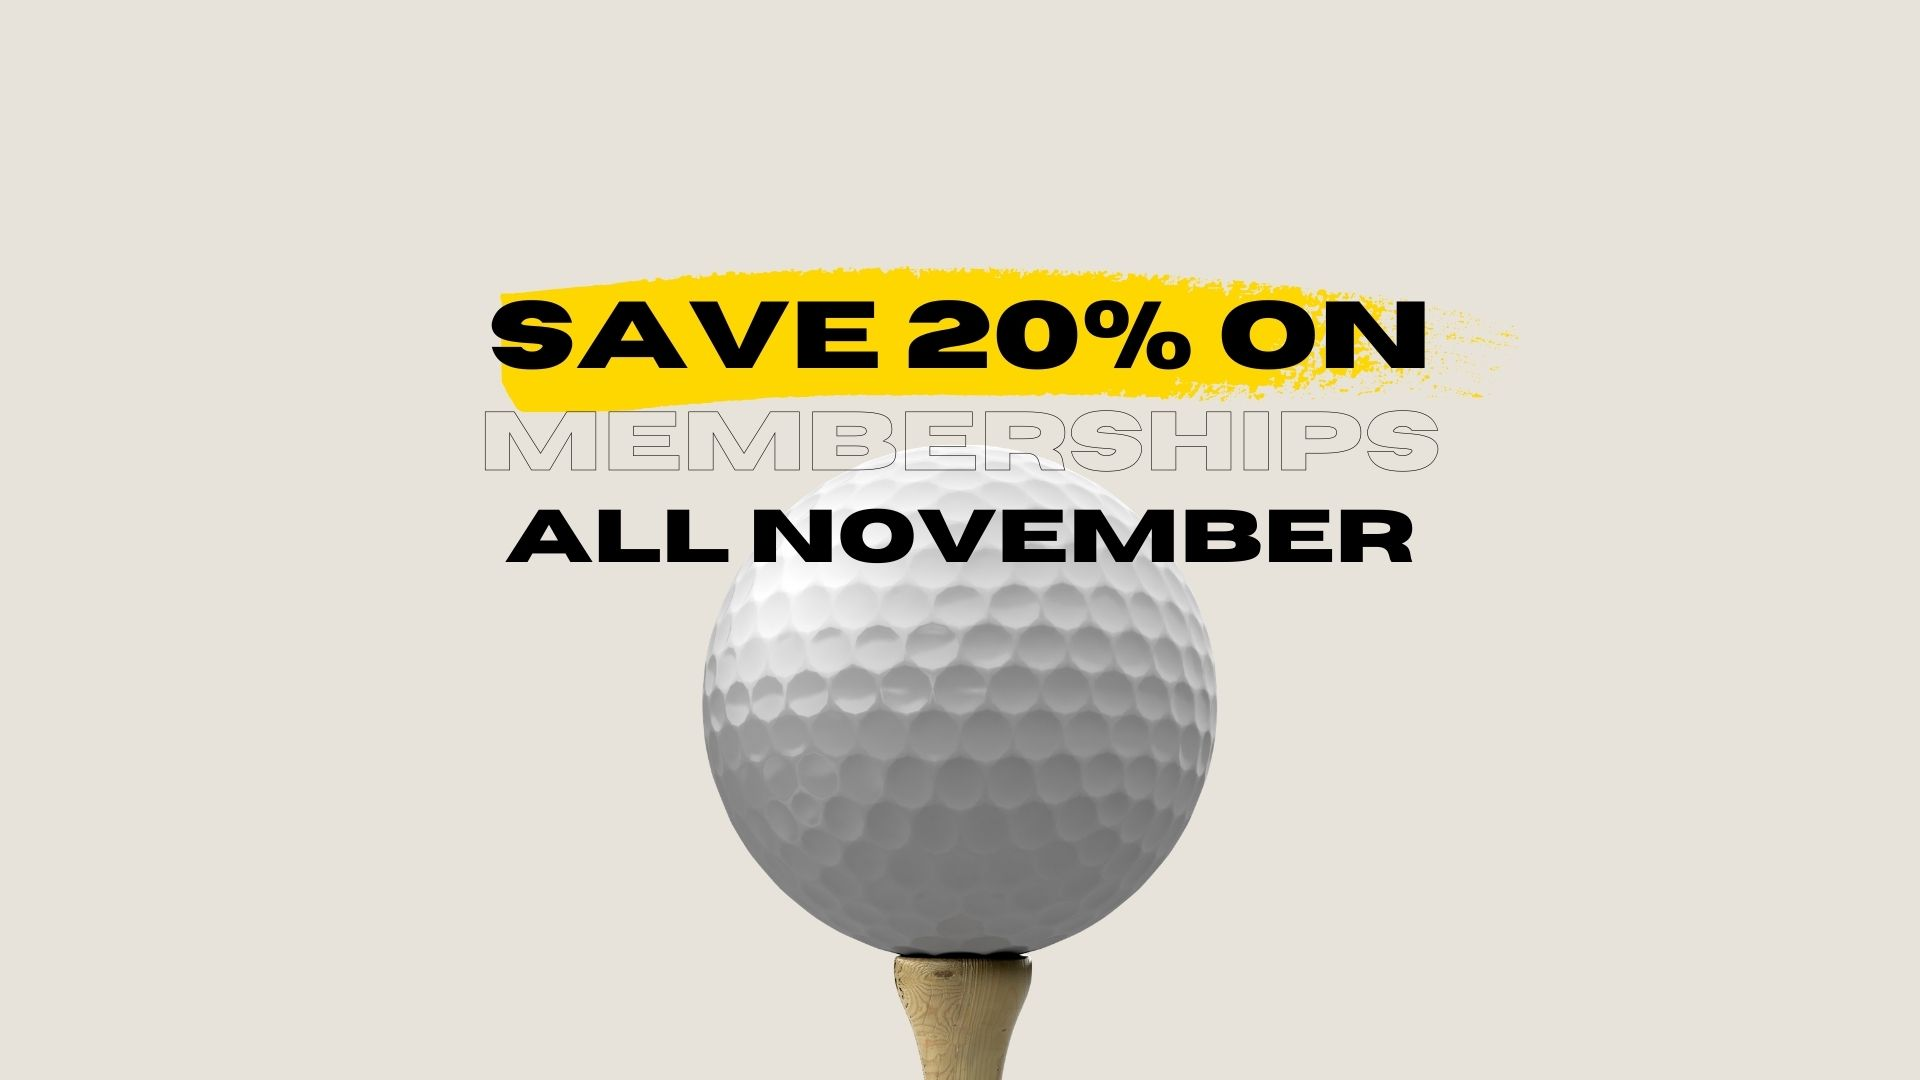 Get 20% OFF memberships all November long!